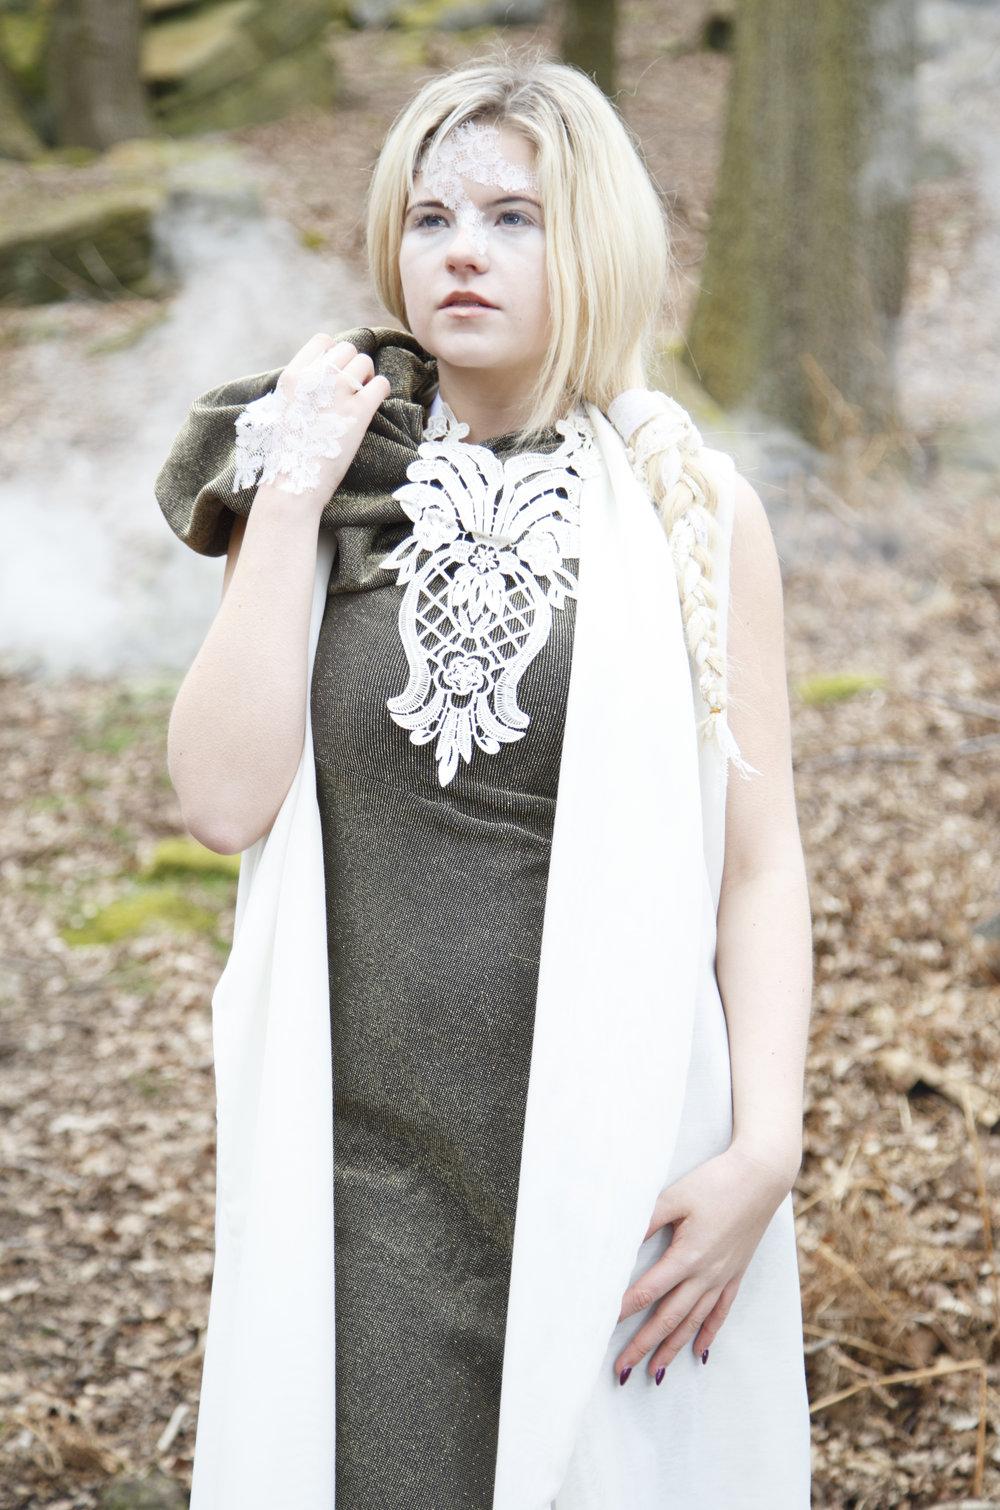 zaramia-ava-zaramiaava-leeds-fashion-designer-ethical-sustainable-smoke-versatile-drape-wrap-gold-cowl-white-dress-styling-location-womenswear-models-photoshoot-location-lace-5